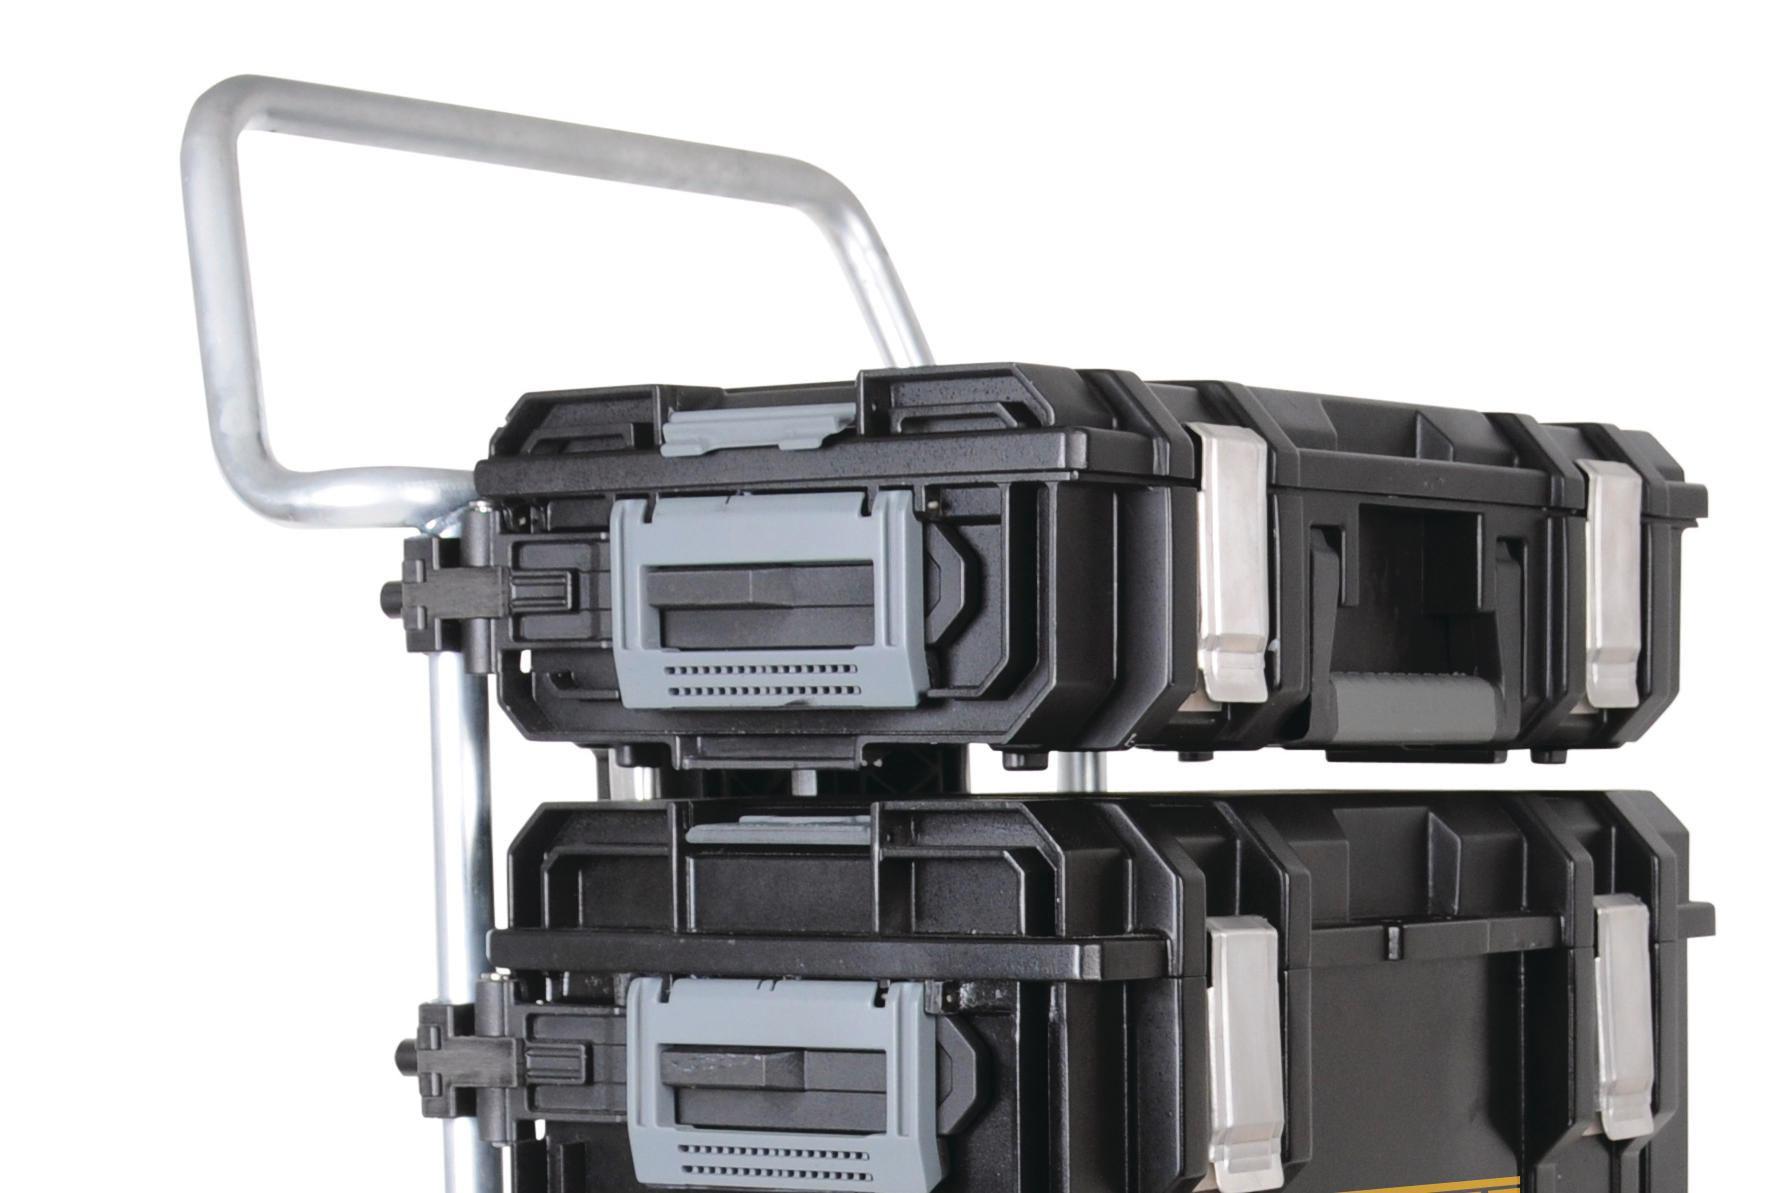 Dewalt S Toughsystem Builder Magazine Products Tools And Equipment Jobsite Equipment